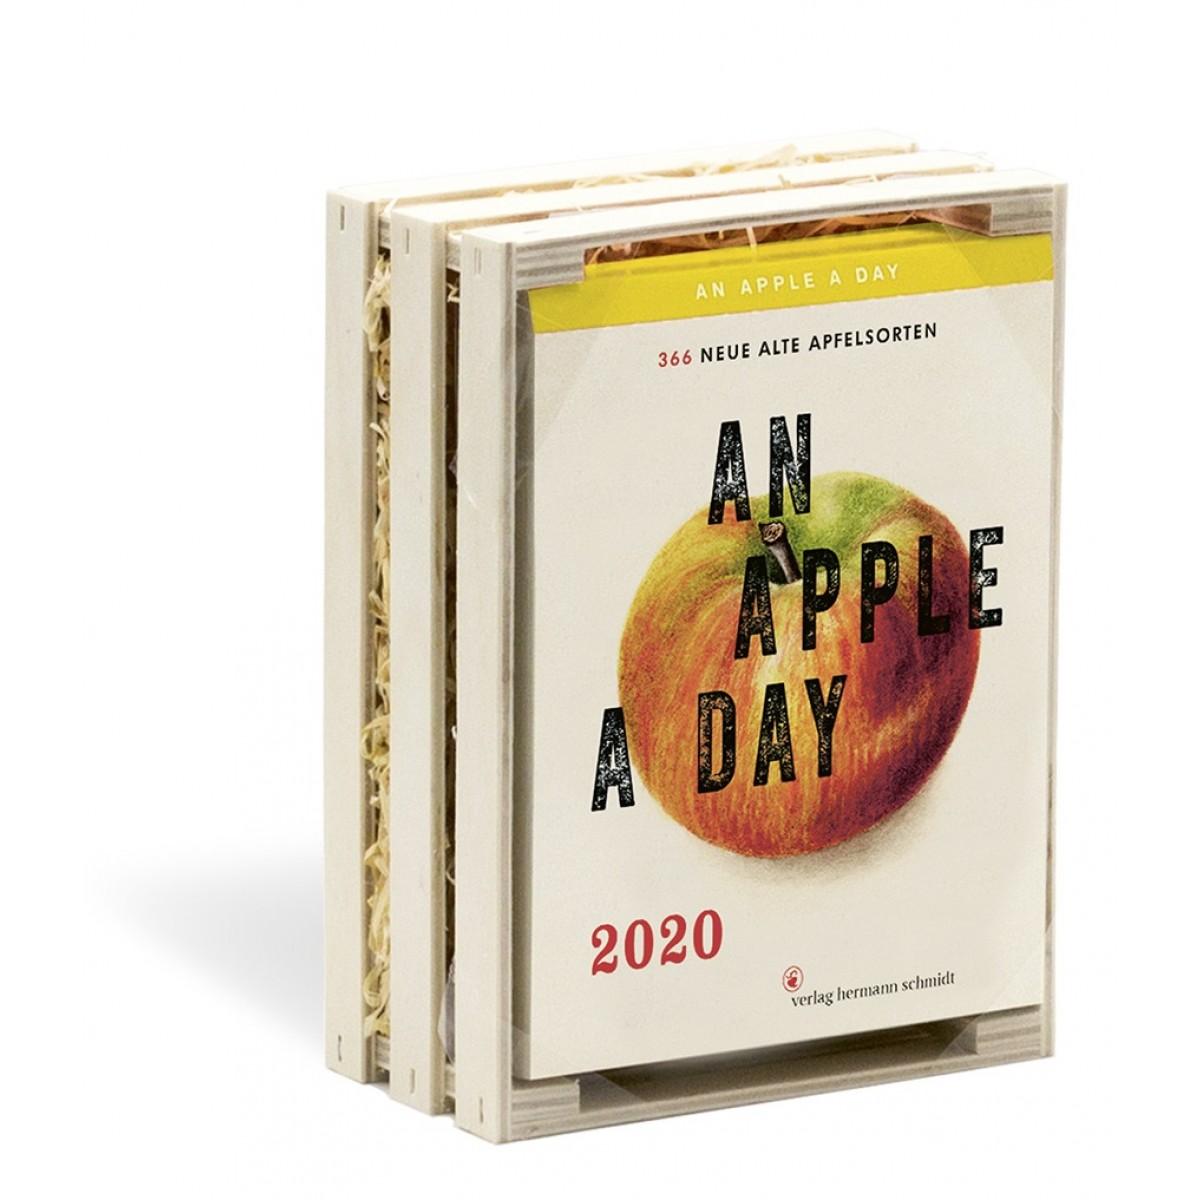 Verlag Hermann Schmidt Jochen Rädeker: An Apple a Day Kalender 2020 - 366 alte Apfelsorten